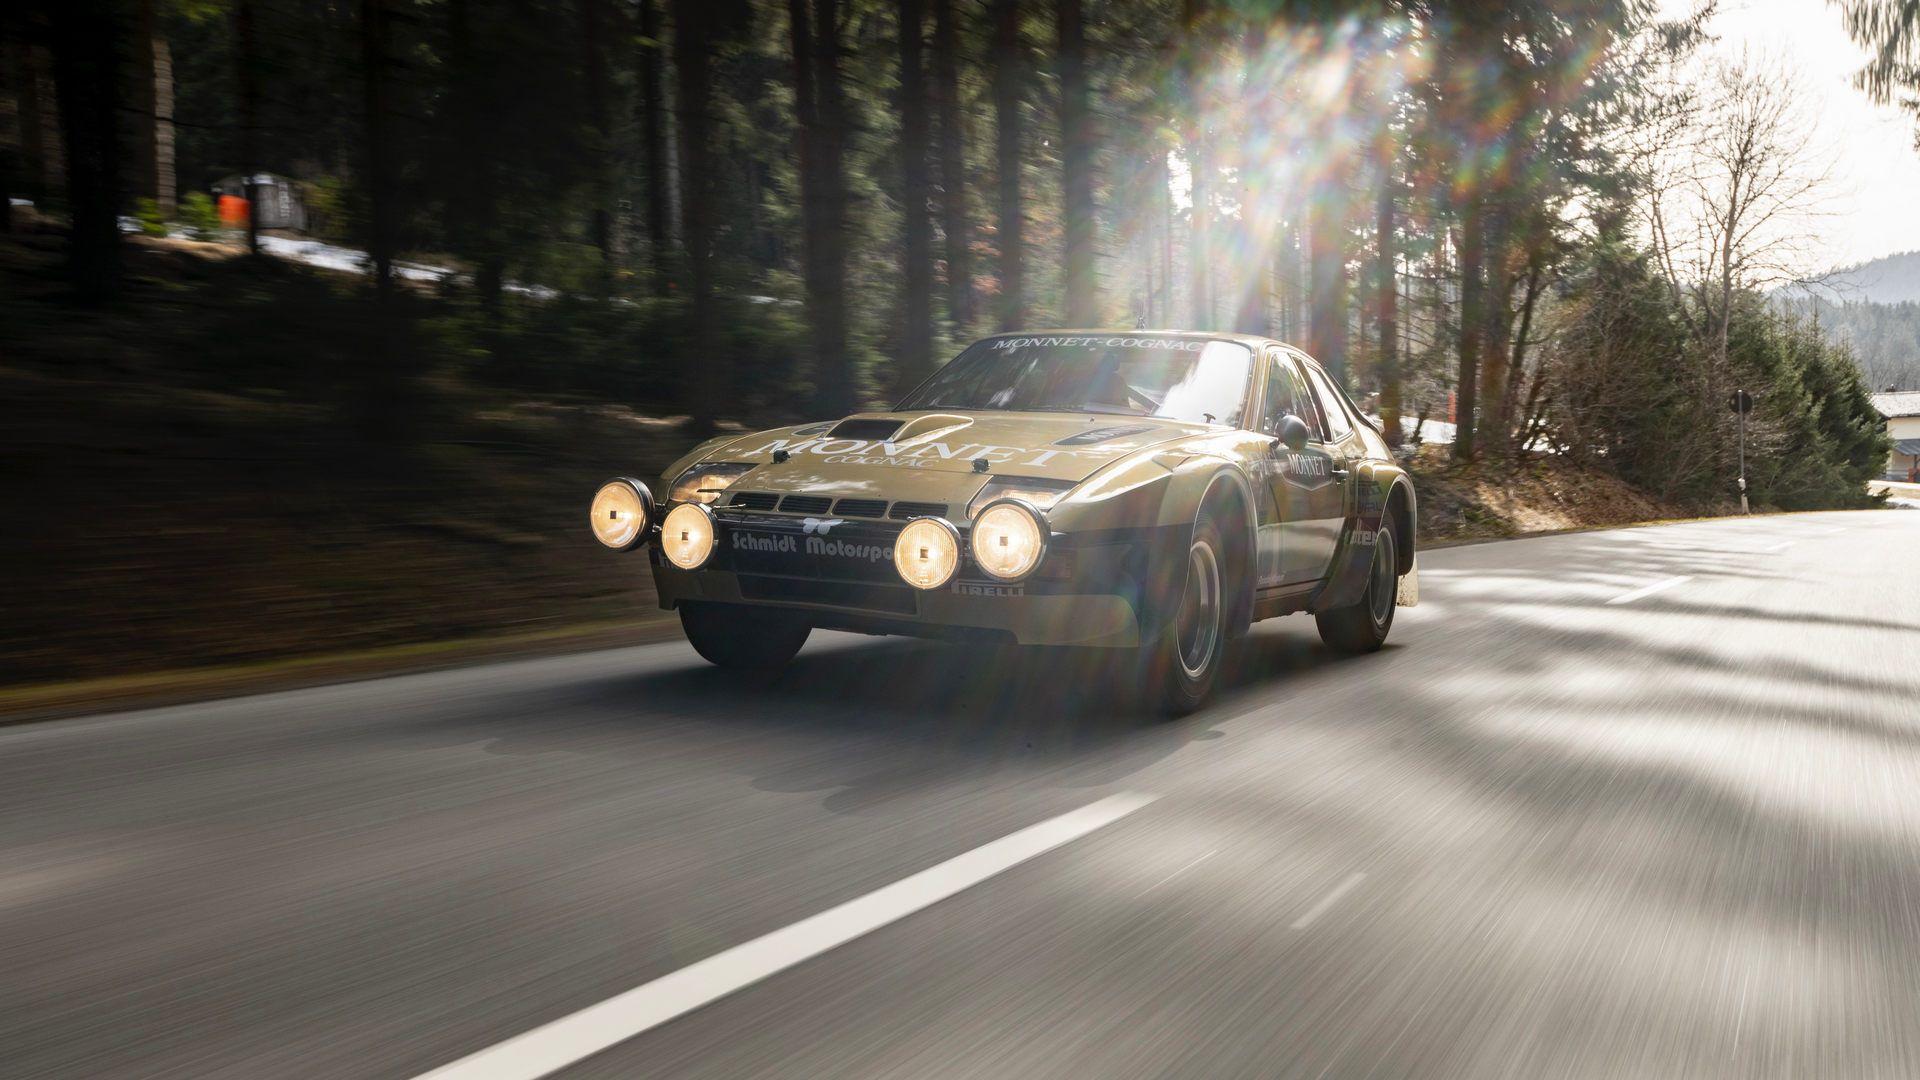 Porsche-924-Carrera-GTS-rally-car-Walter-Rohrl-10